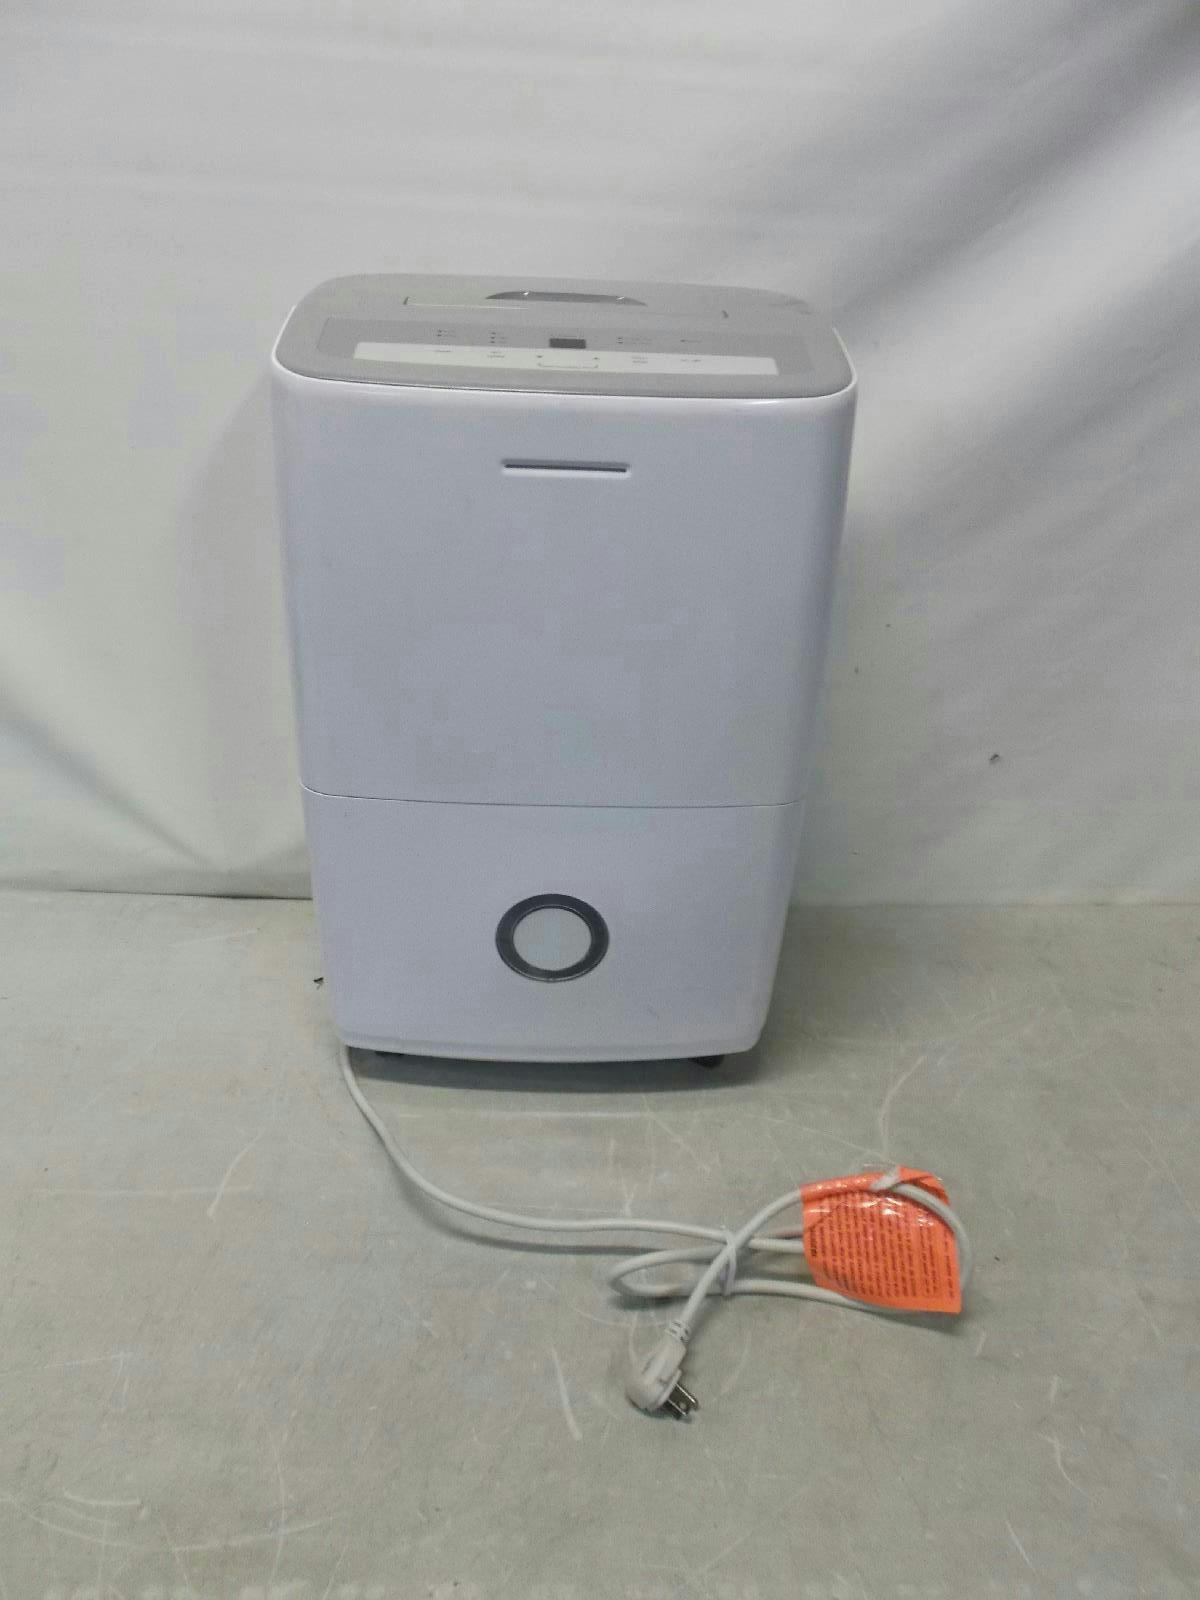 FFAD7033R1 EnergyStar Dehumidifier w/Humidity Control 70 pint $302.25 #9D492E